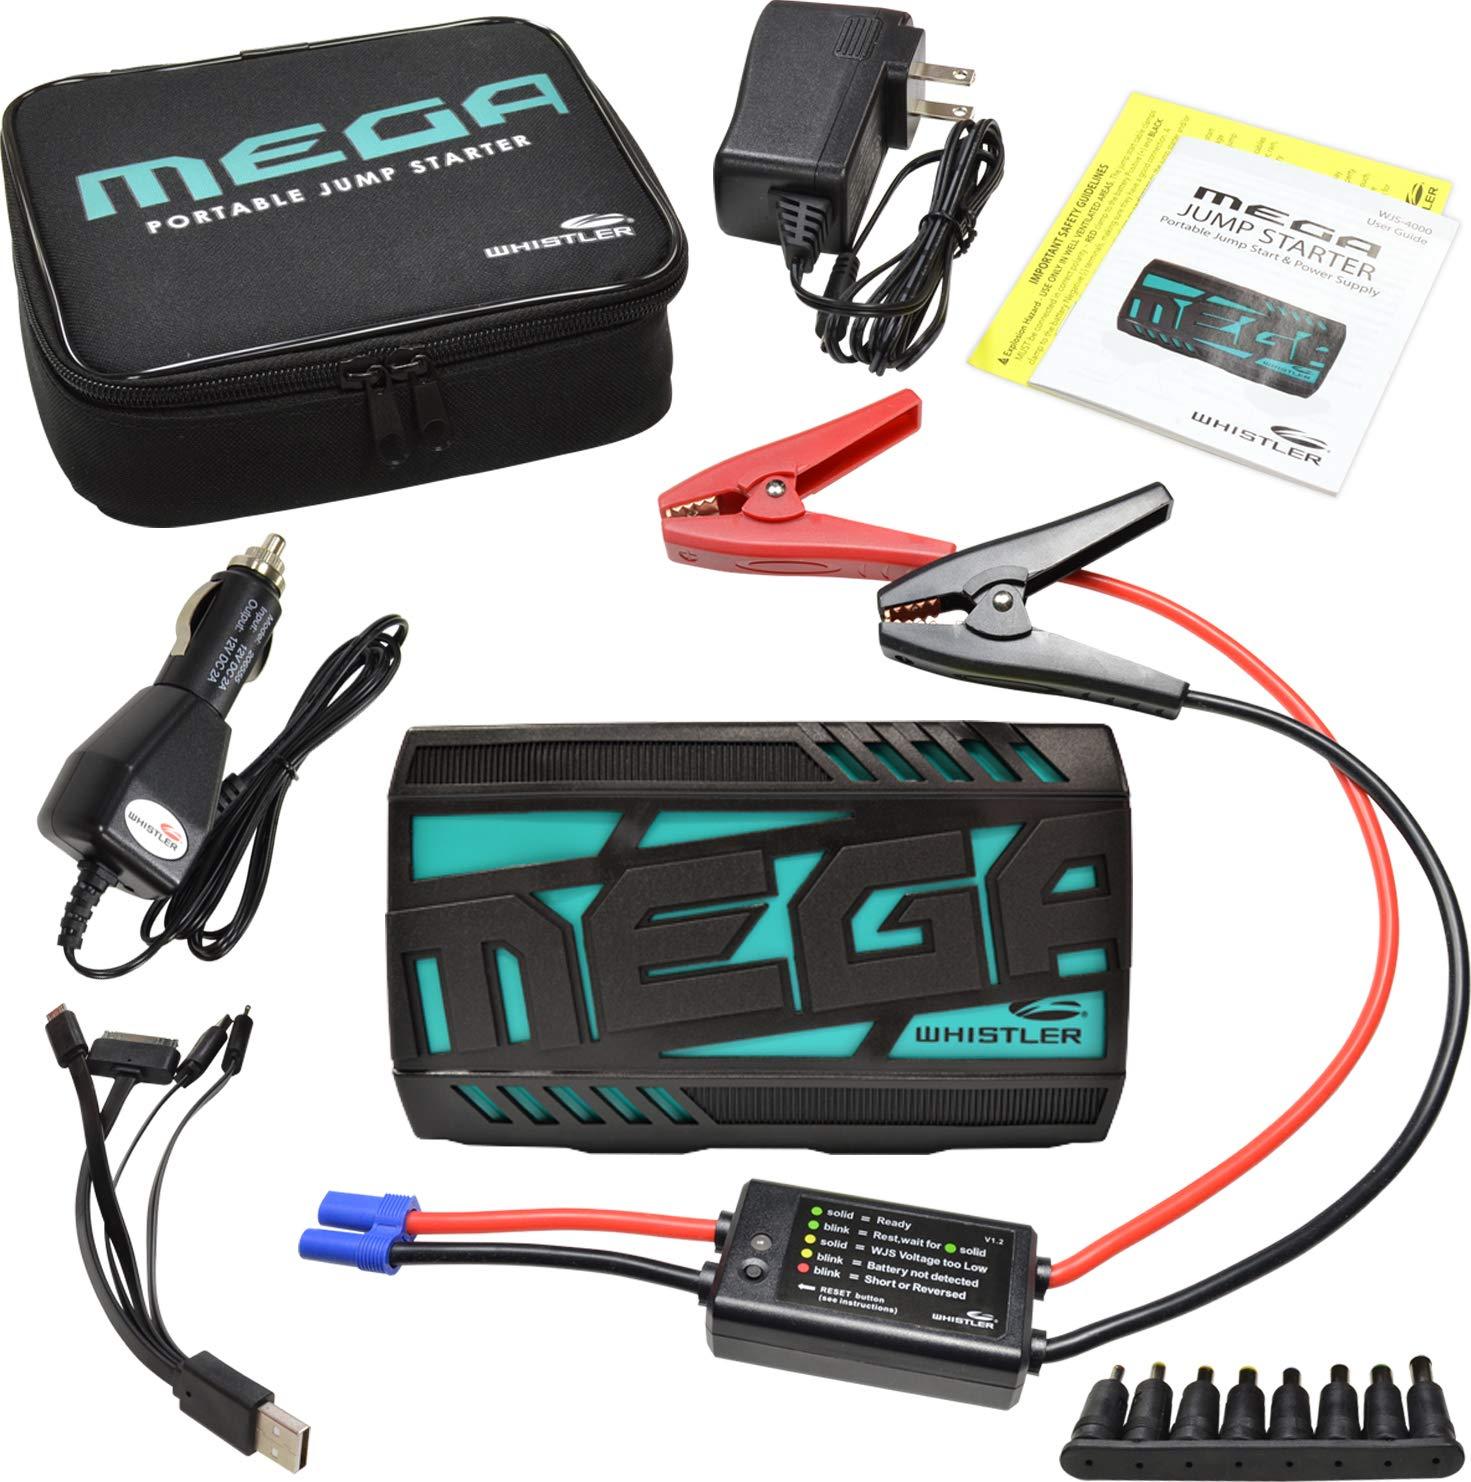 1d10071f33e Amazon.com: Whistler WJS-4000 MEGA Portable Lithium Jump Starter: 240  Starting Amps / 480 Peak Amps: WHISTLER: Automotive